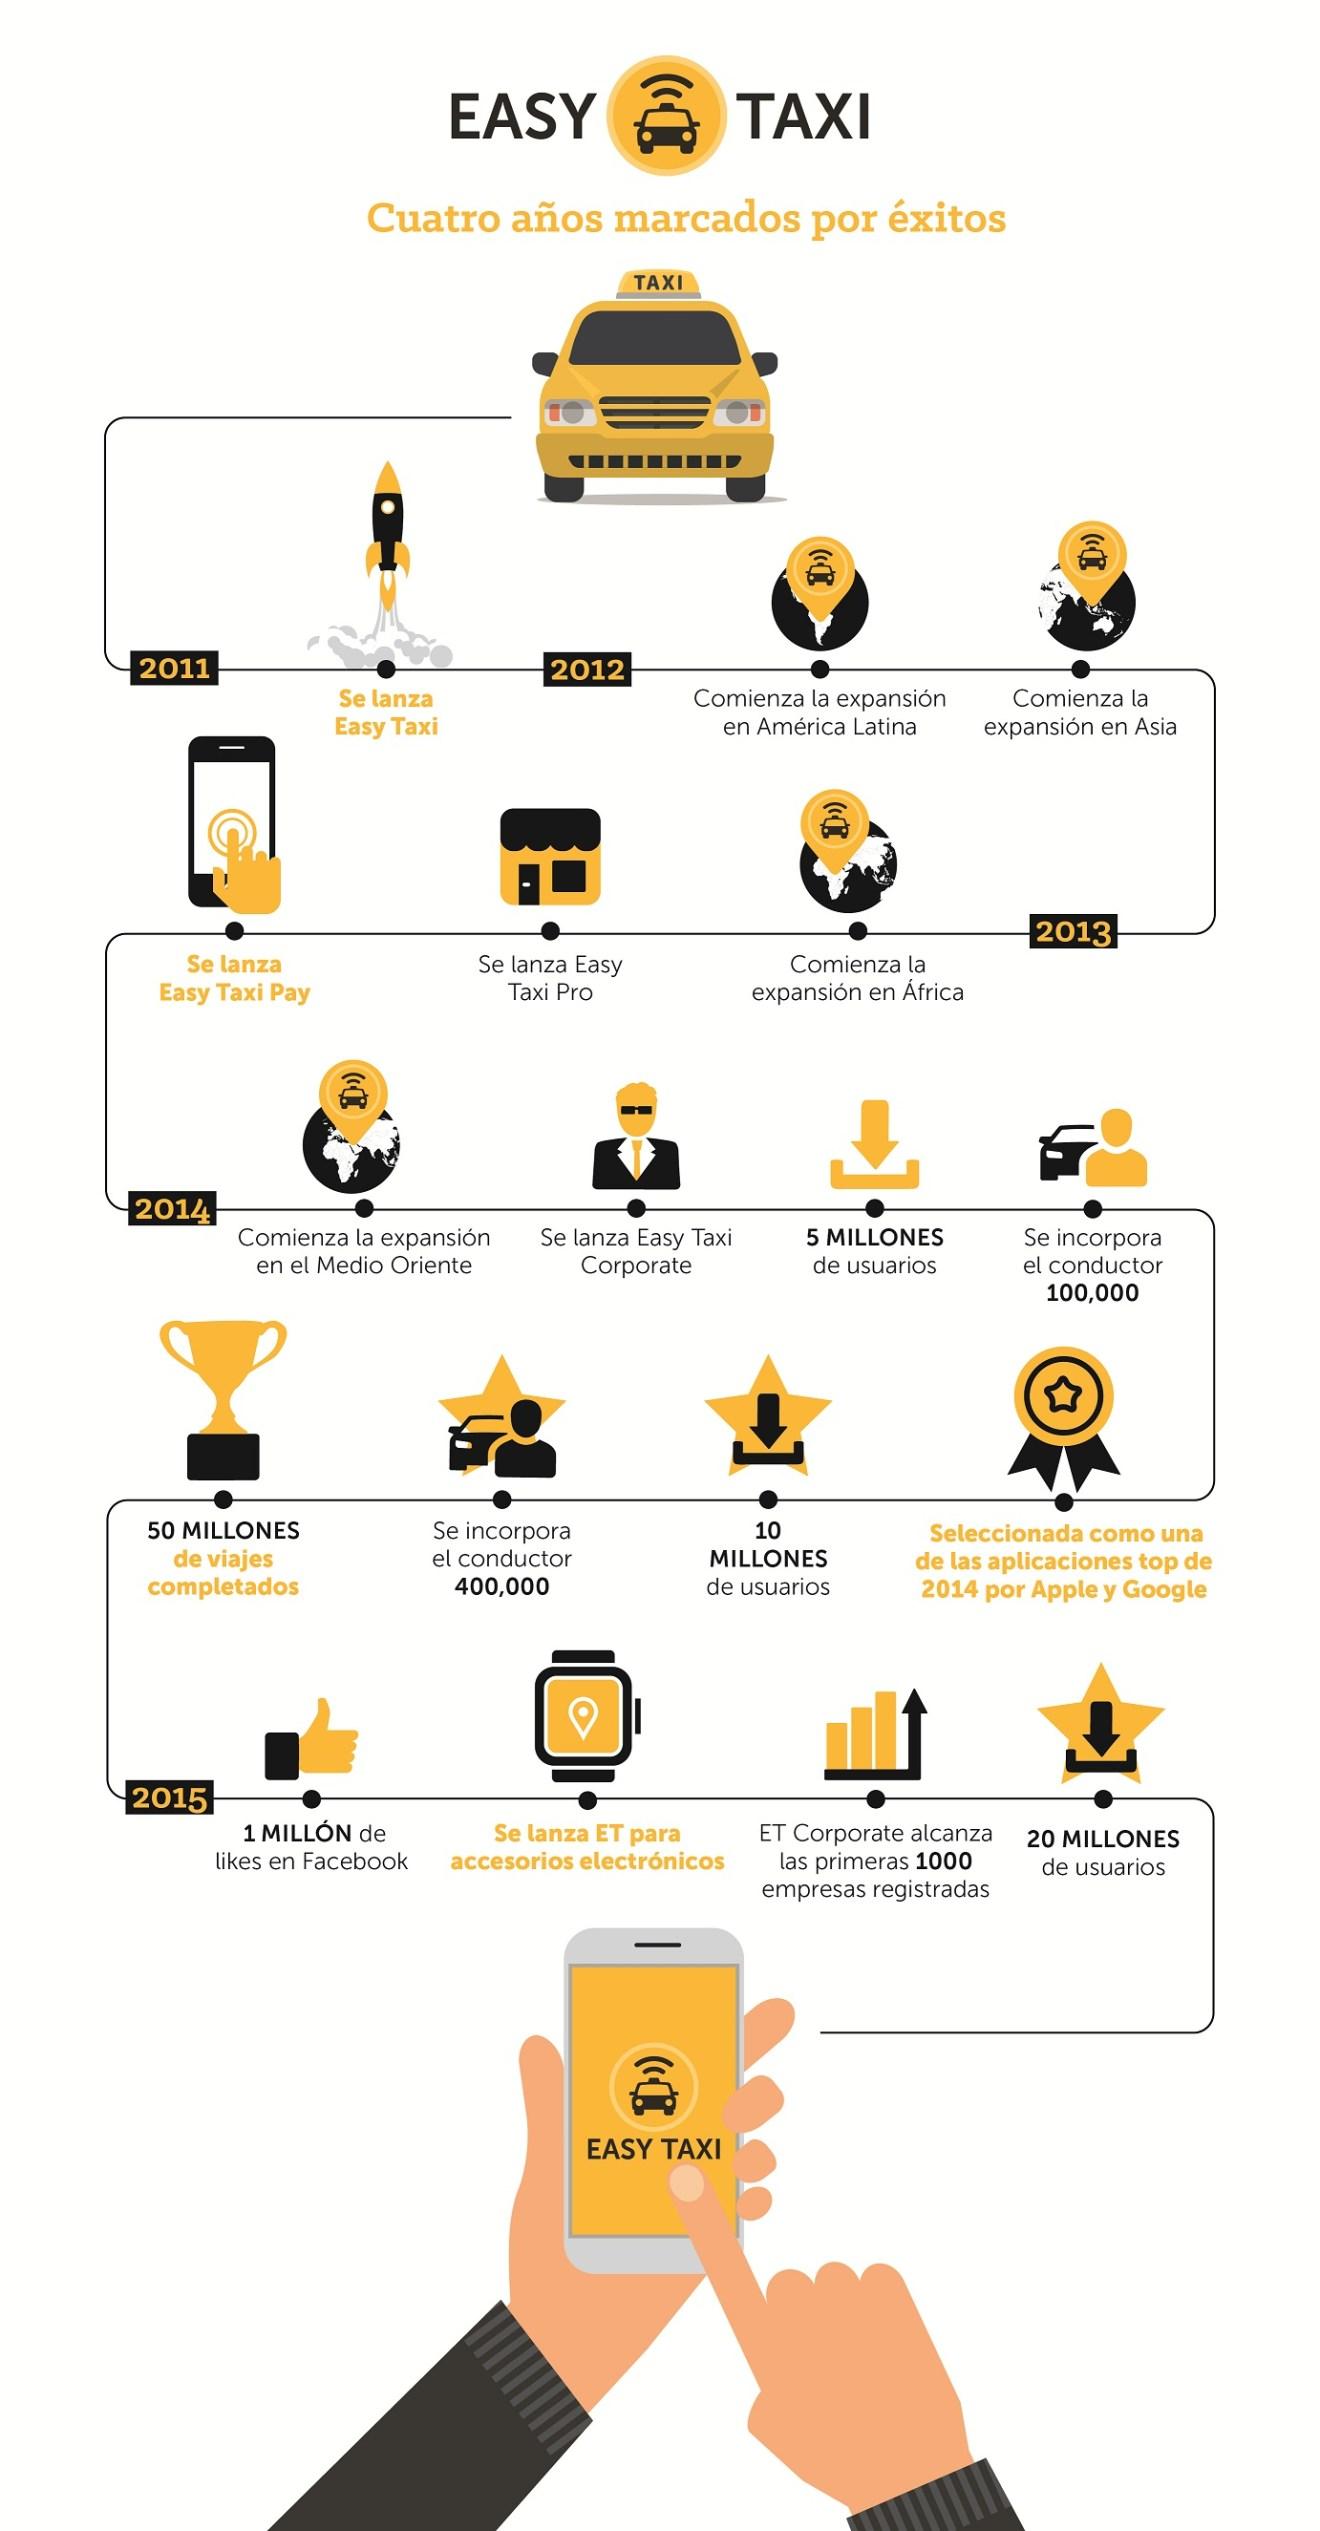 Infofografía Easy Taxi con 4 años de éxitos jun 23 15 md